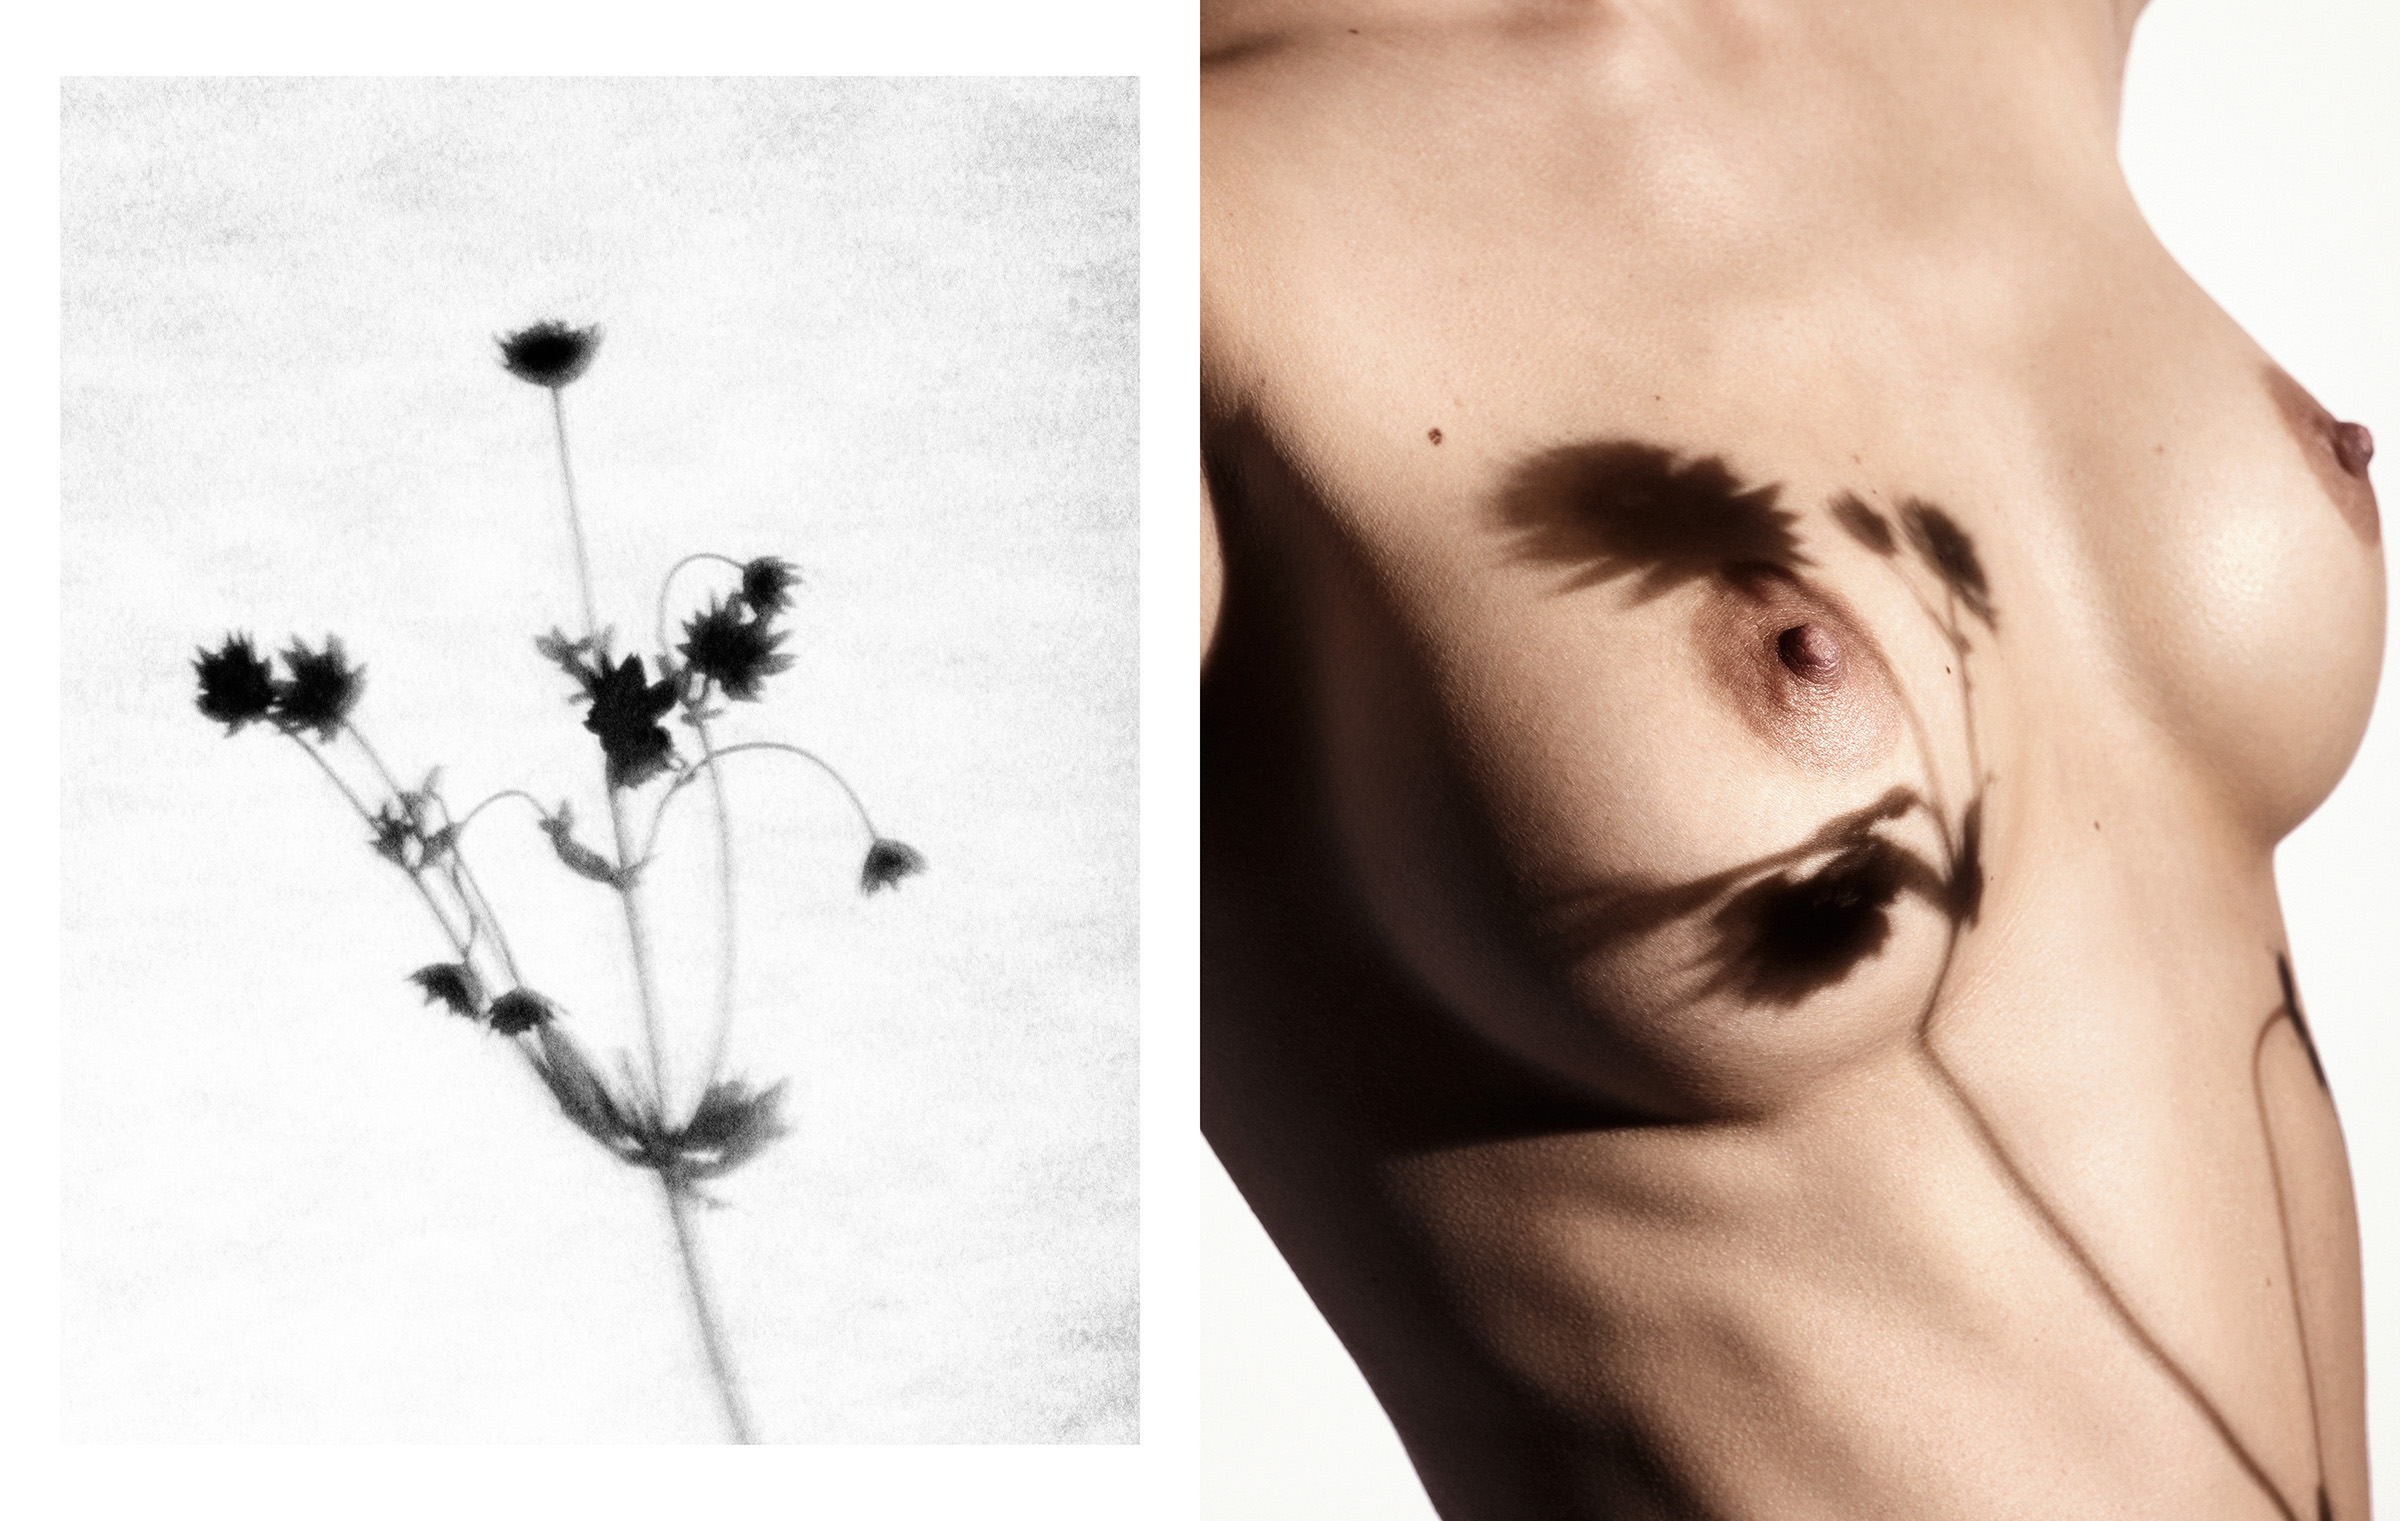 Flower_Tattoos_Layout3.jpg